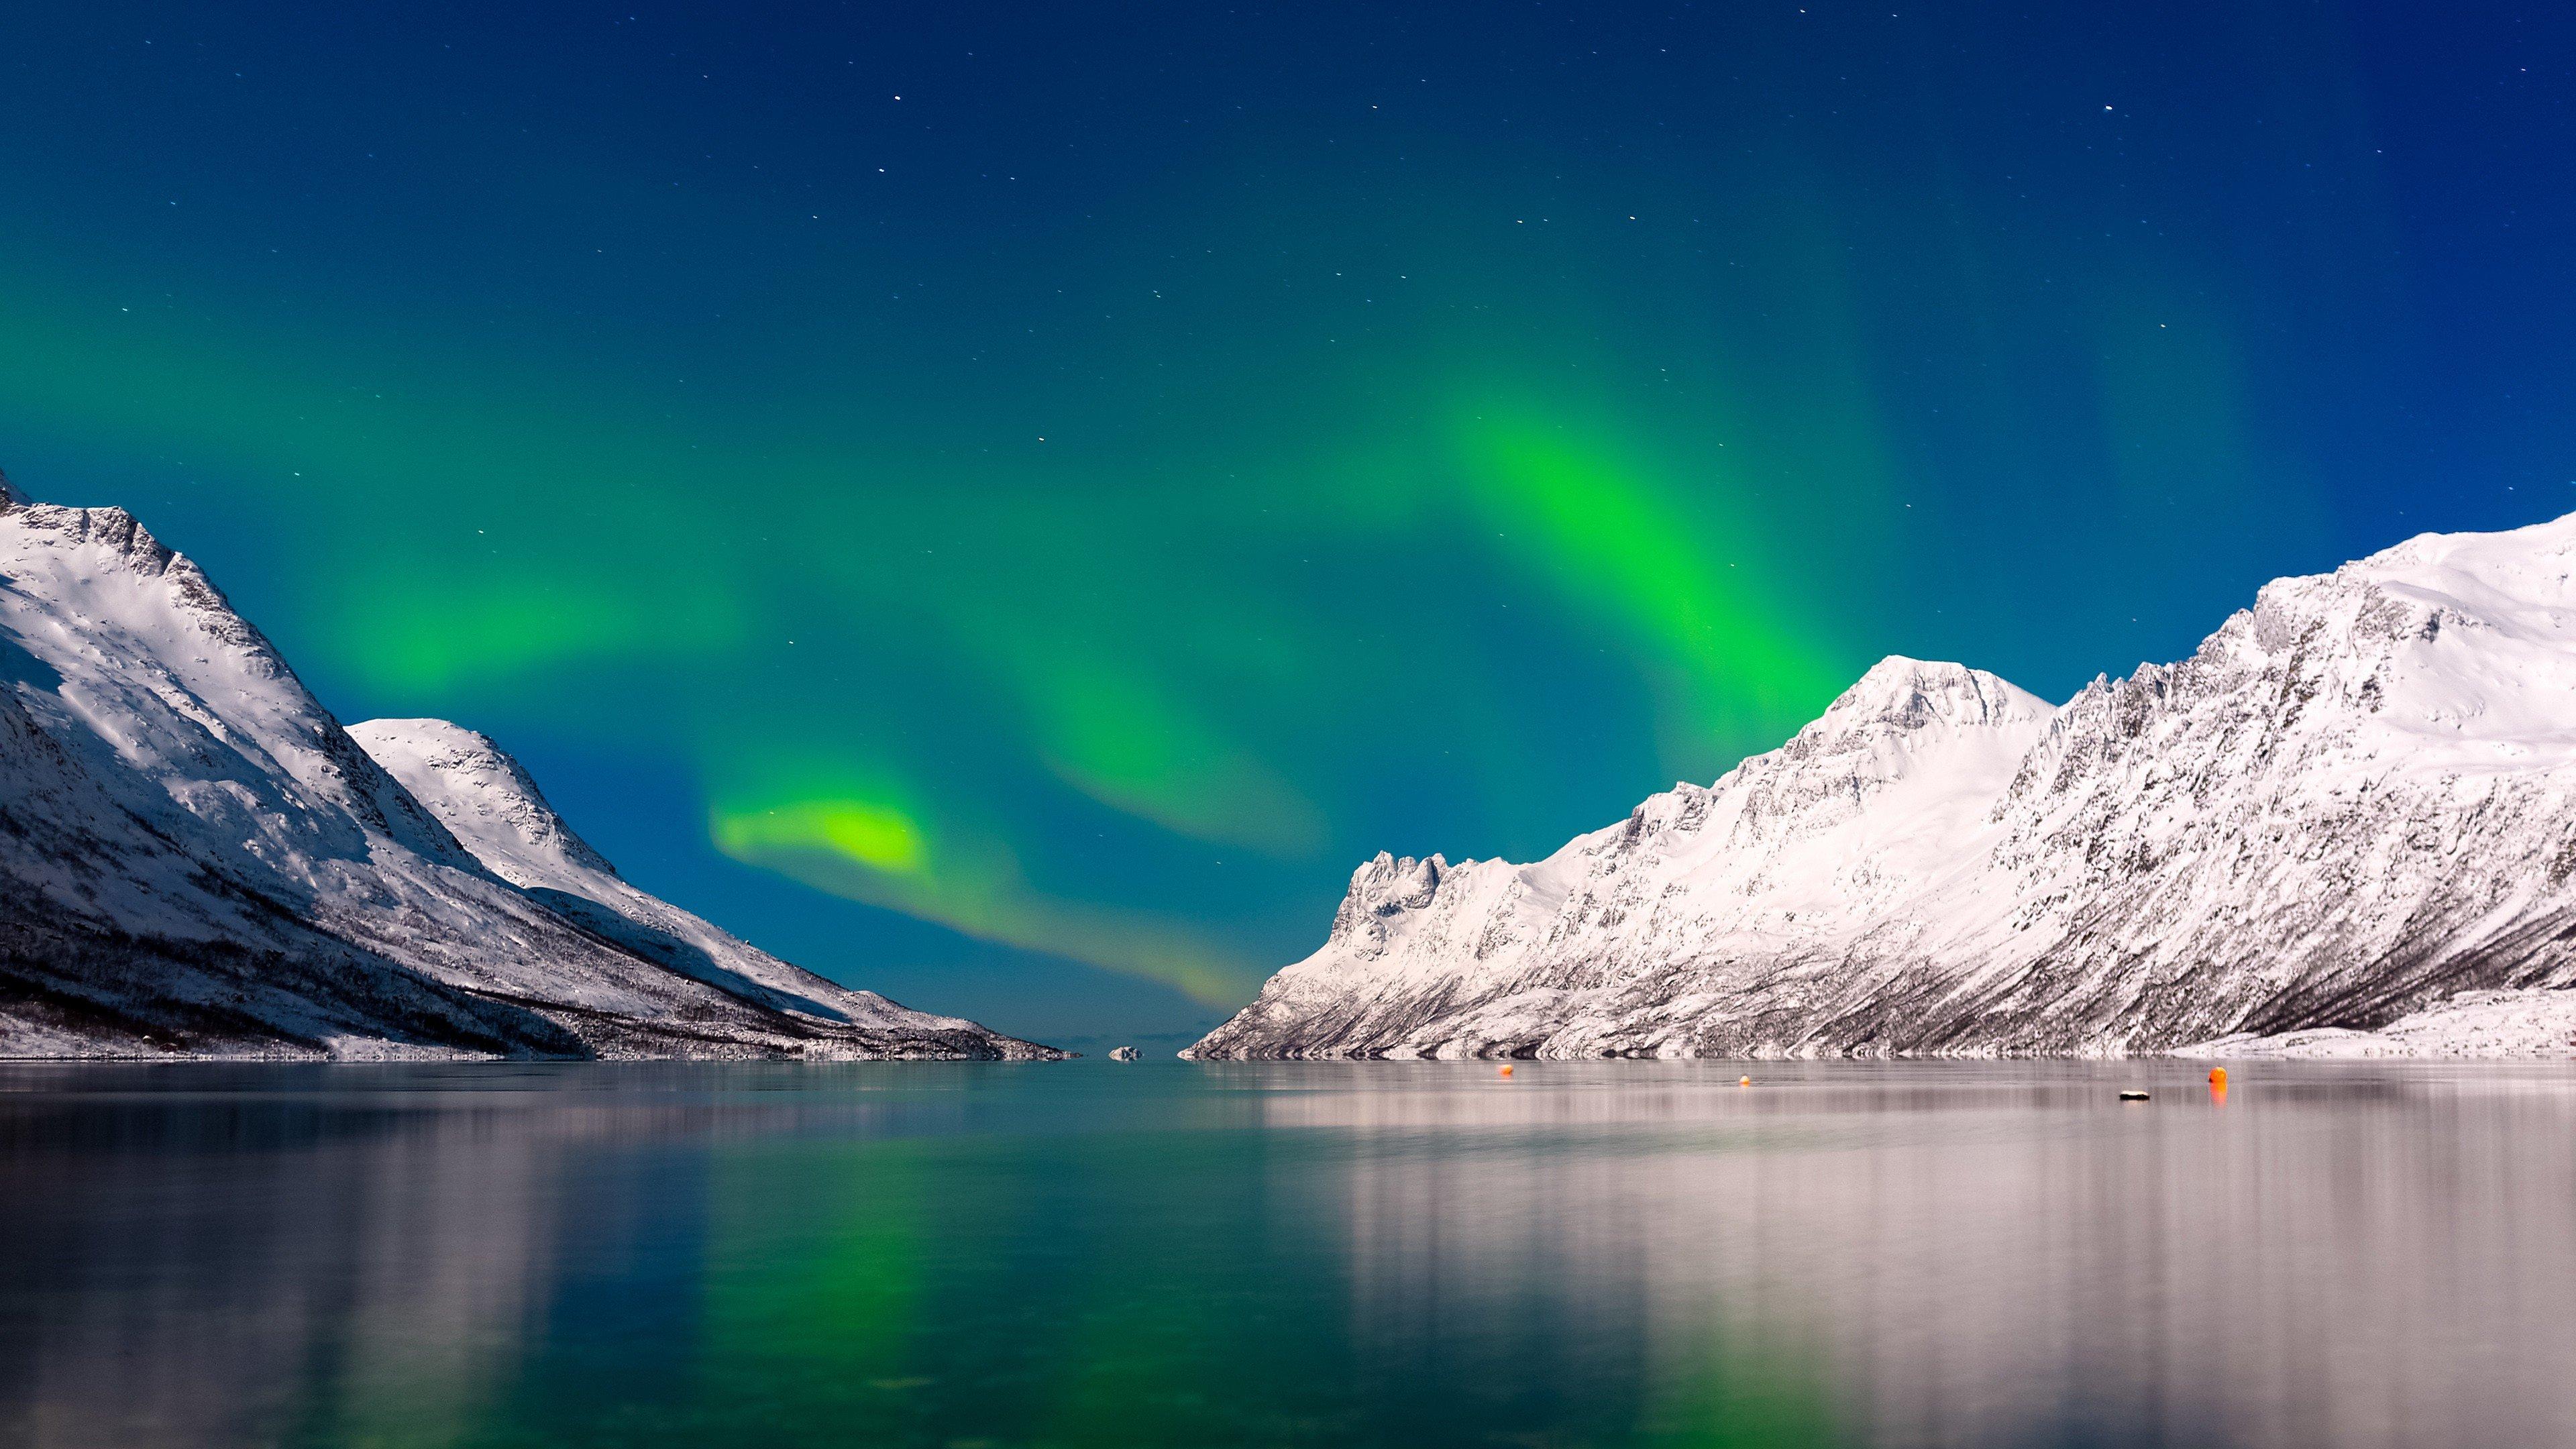 Fondos de pantalla Aurora polar en lago y montañas